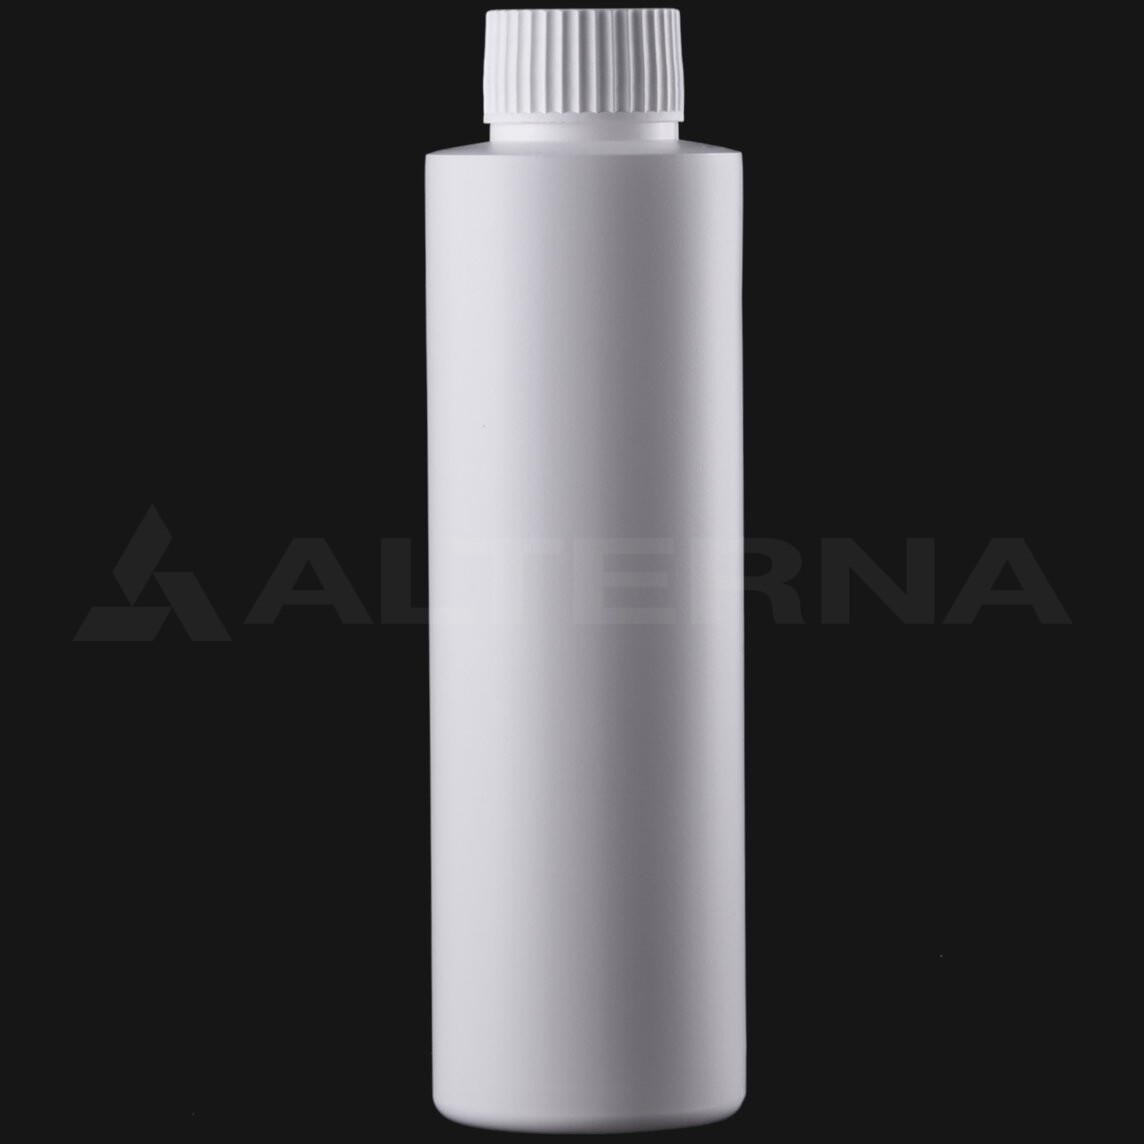 250 ml HDPE Bottle with 28 mm Foam Seal Cap